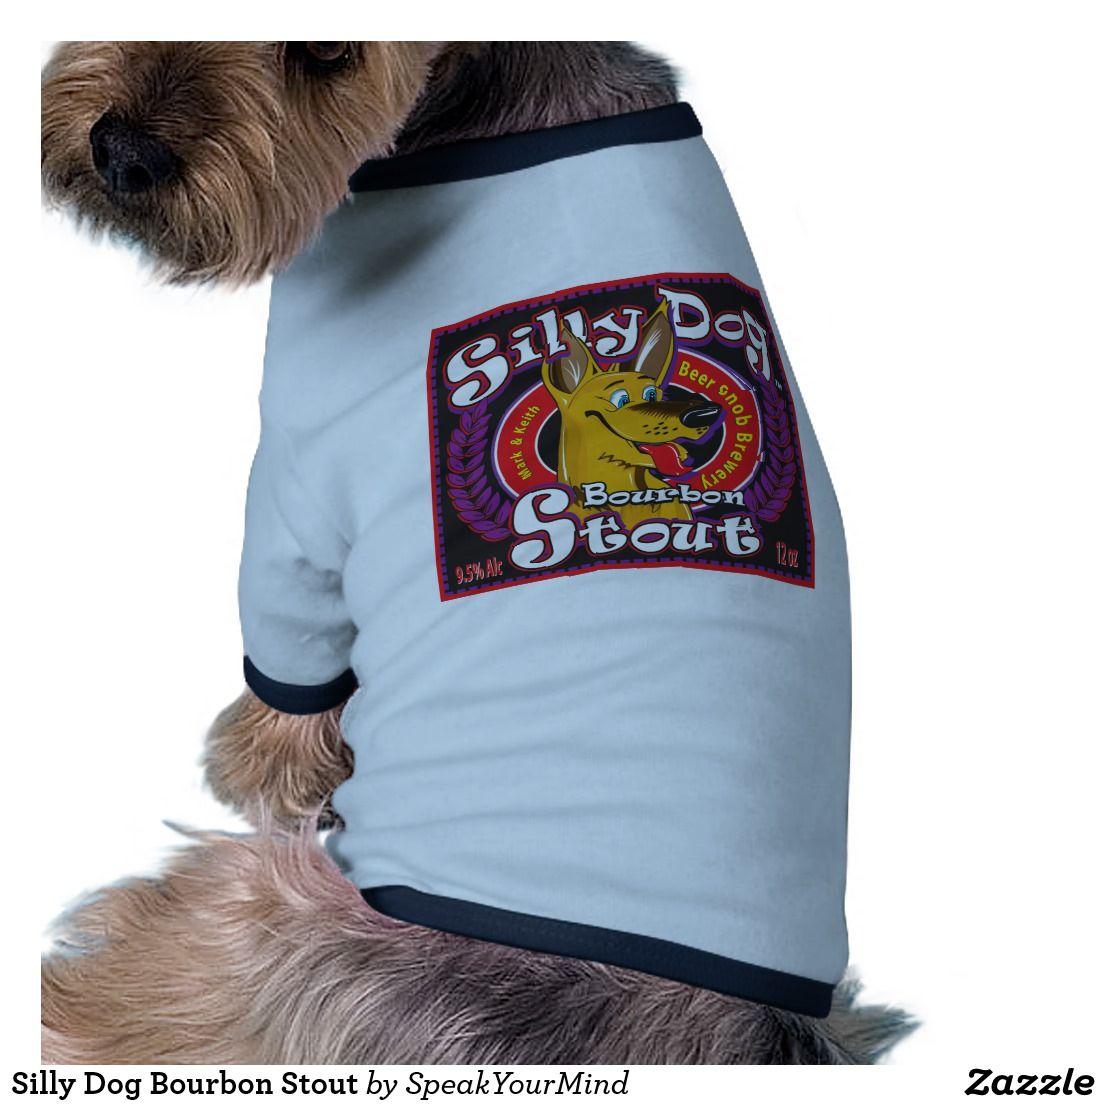 Silly Dog Bourbon Stout Shirt